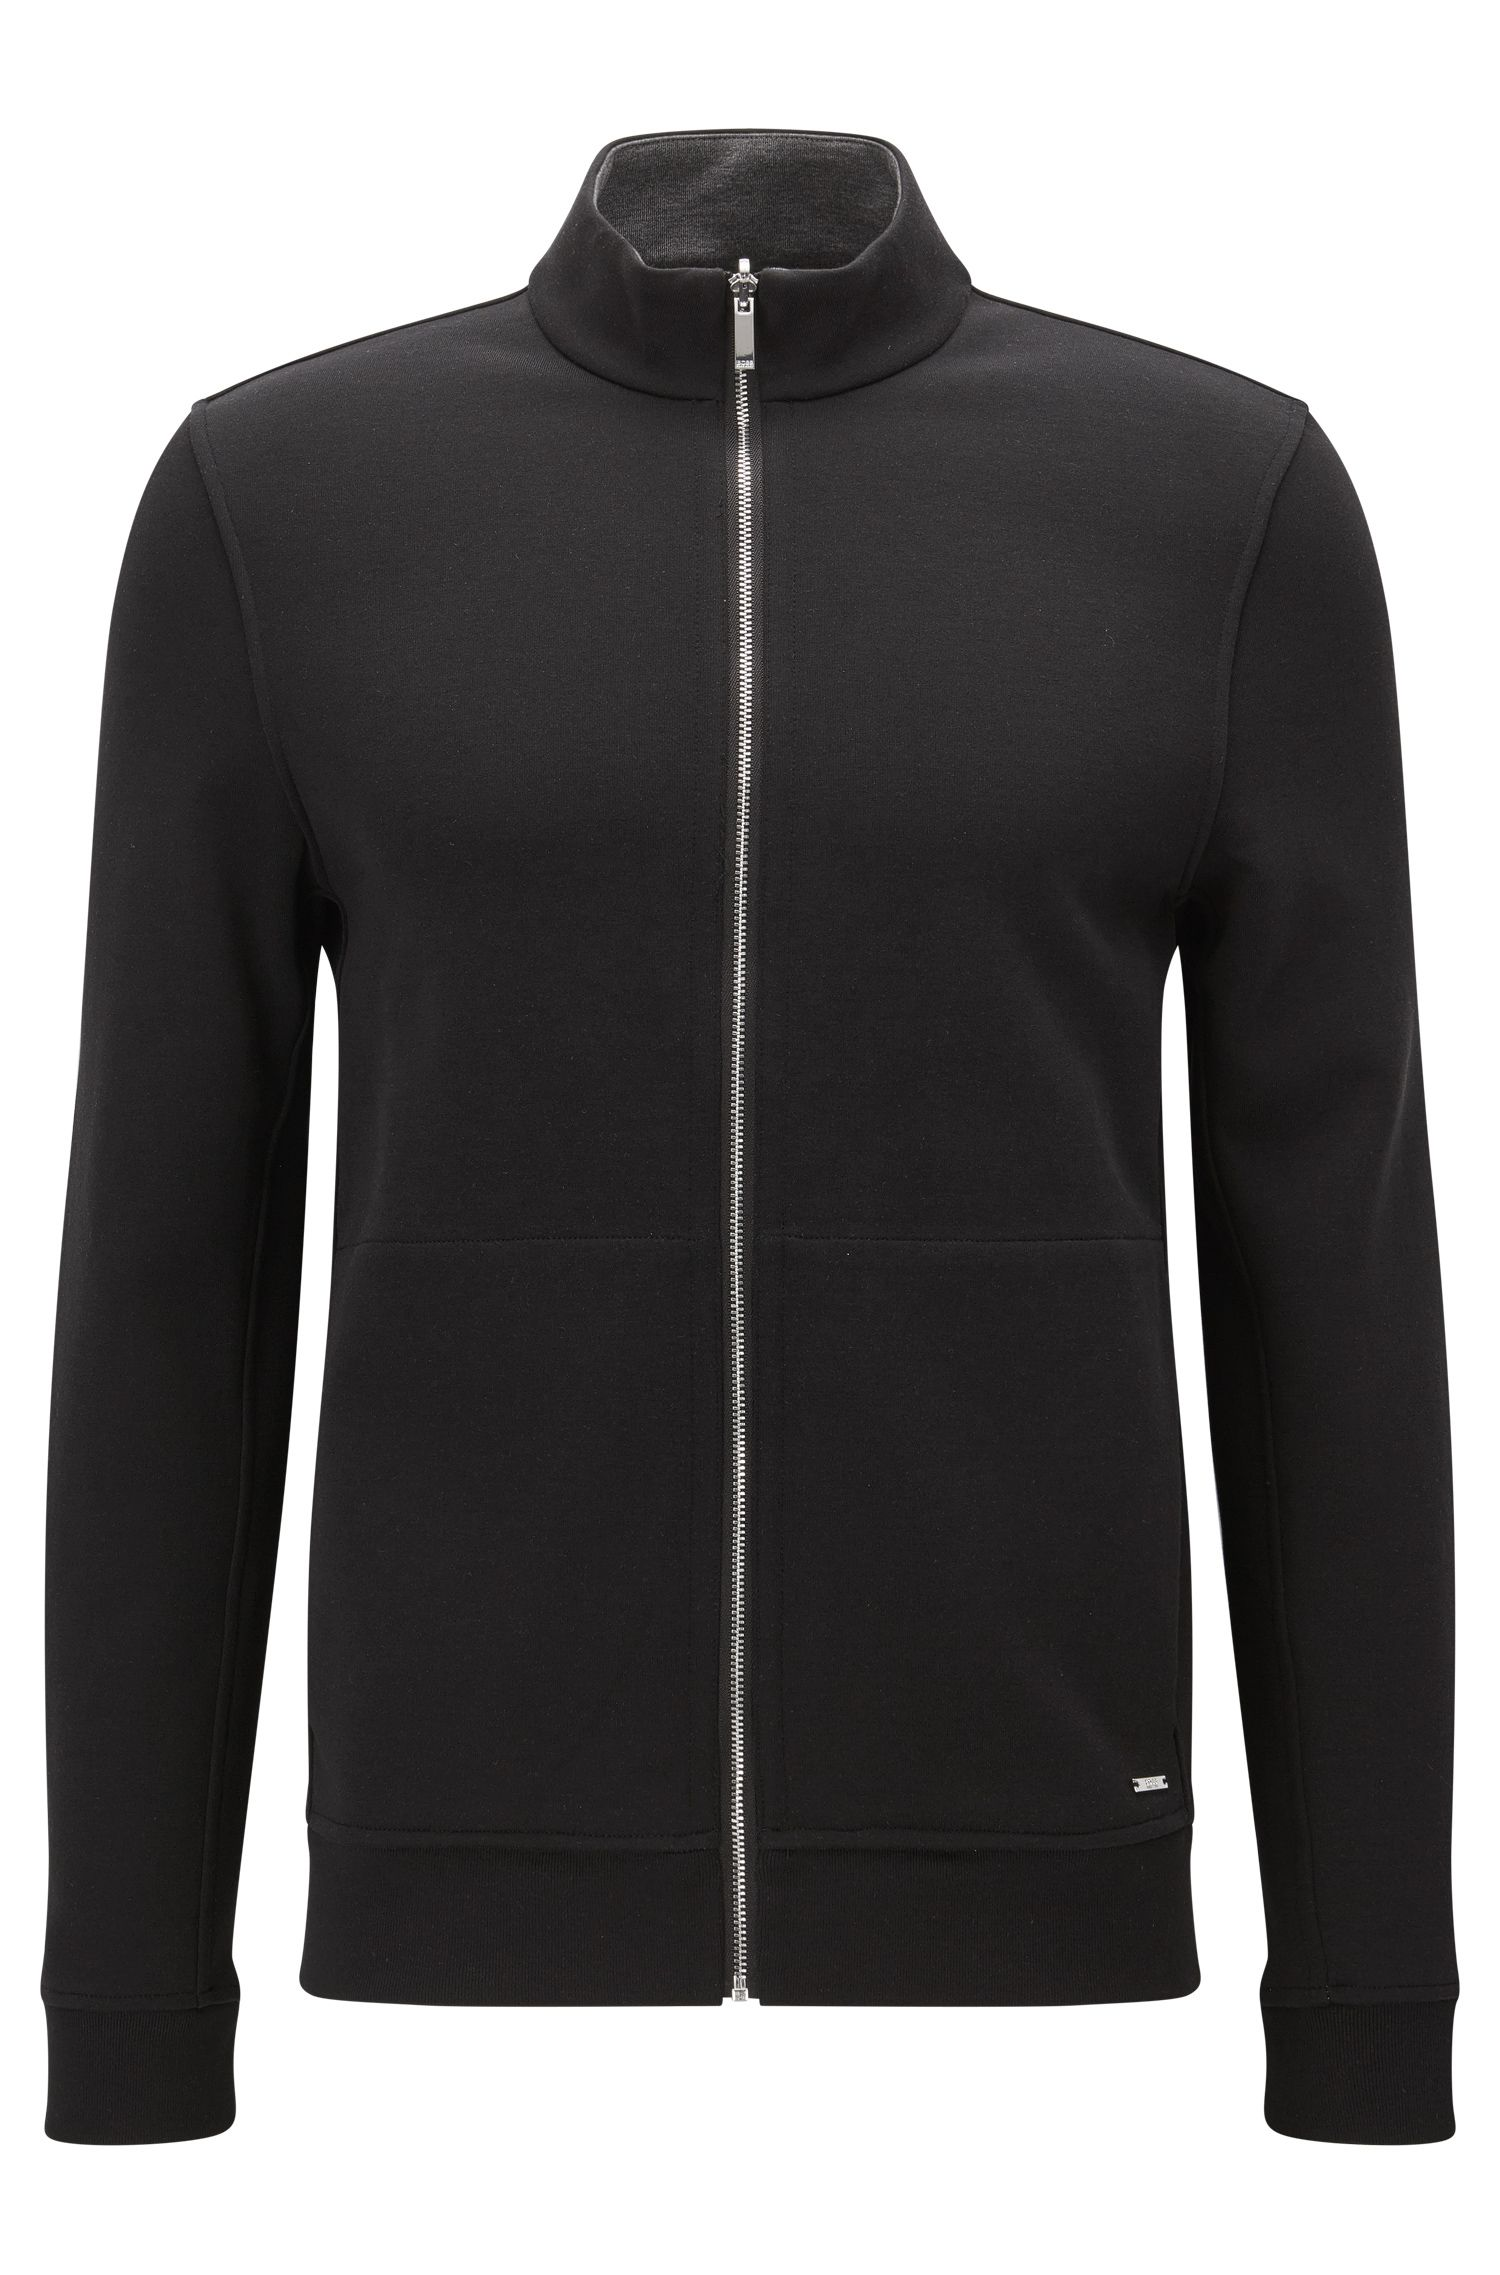 'Scavo'   Cotton Blend Full-Zip Sweater, Black